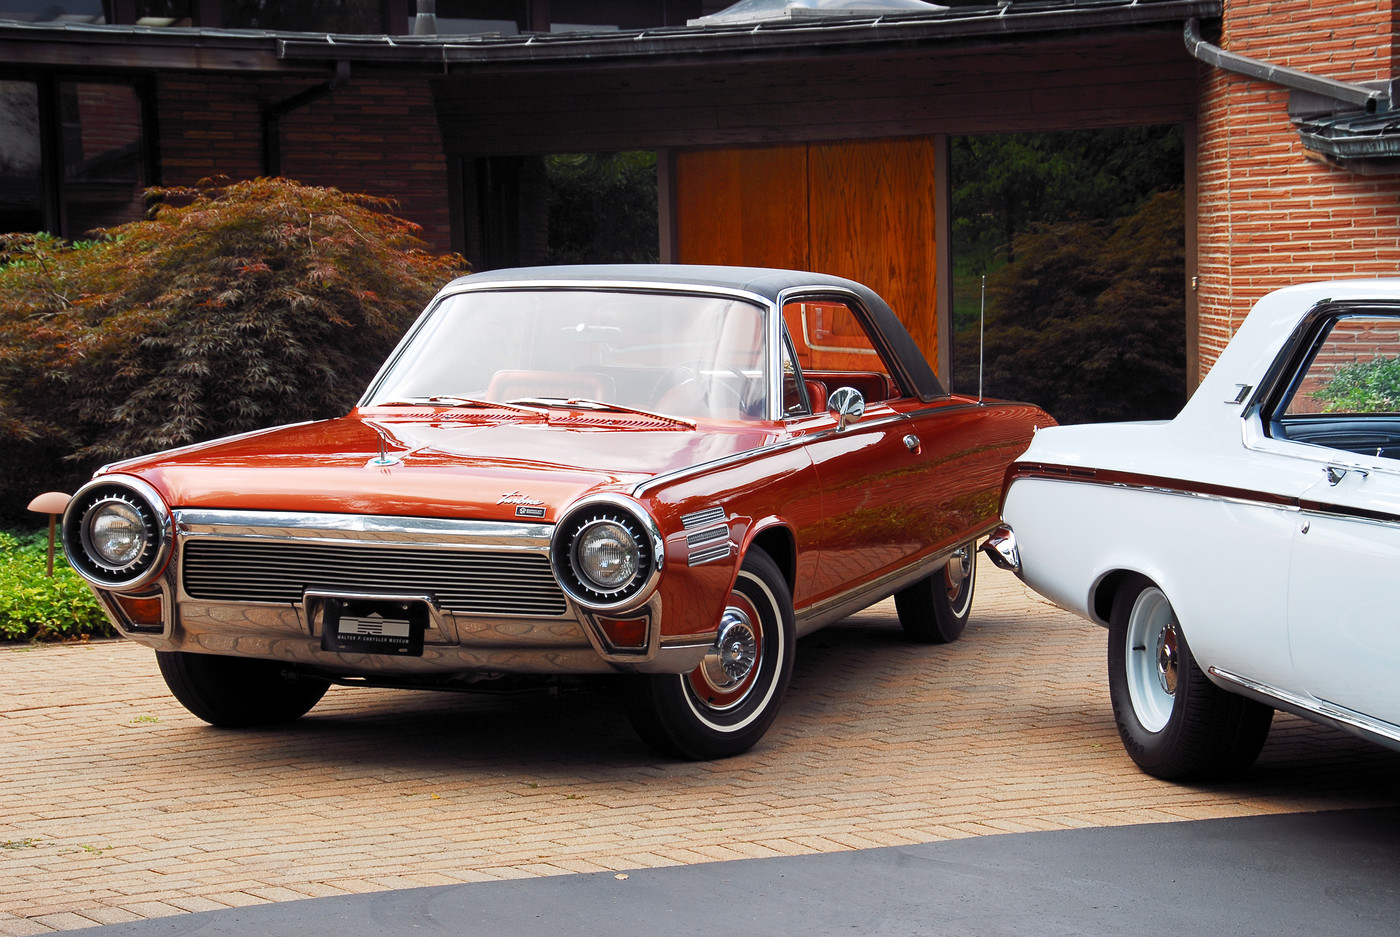 10 1963 Chrysler Ghia Turbine Car with 1963 Dodge Polara front view at sixties-era modern home